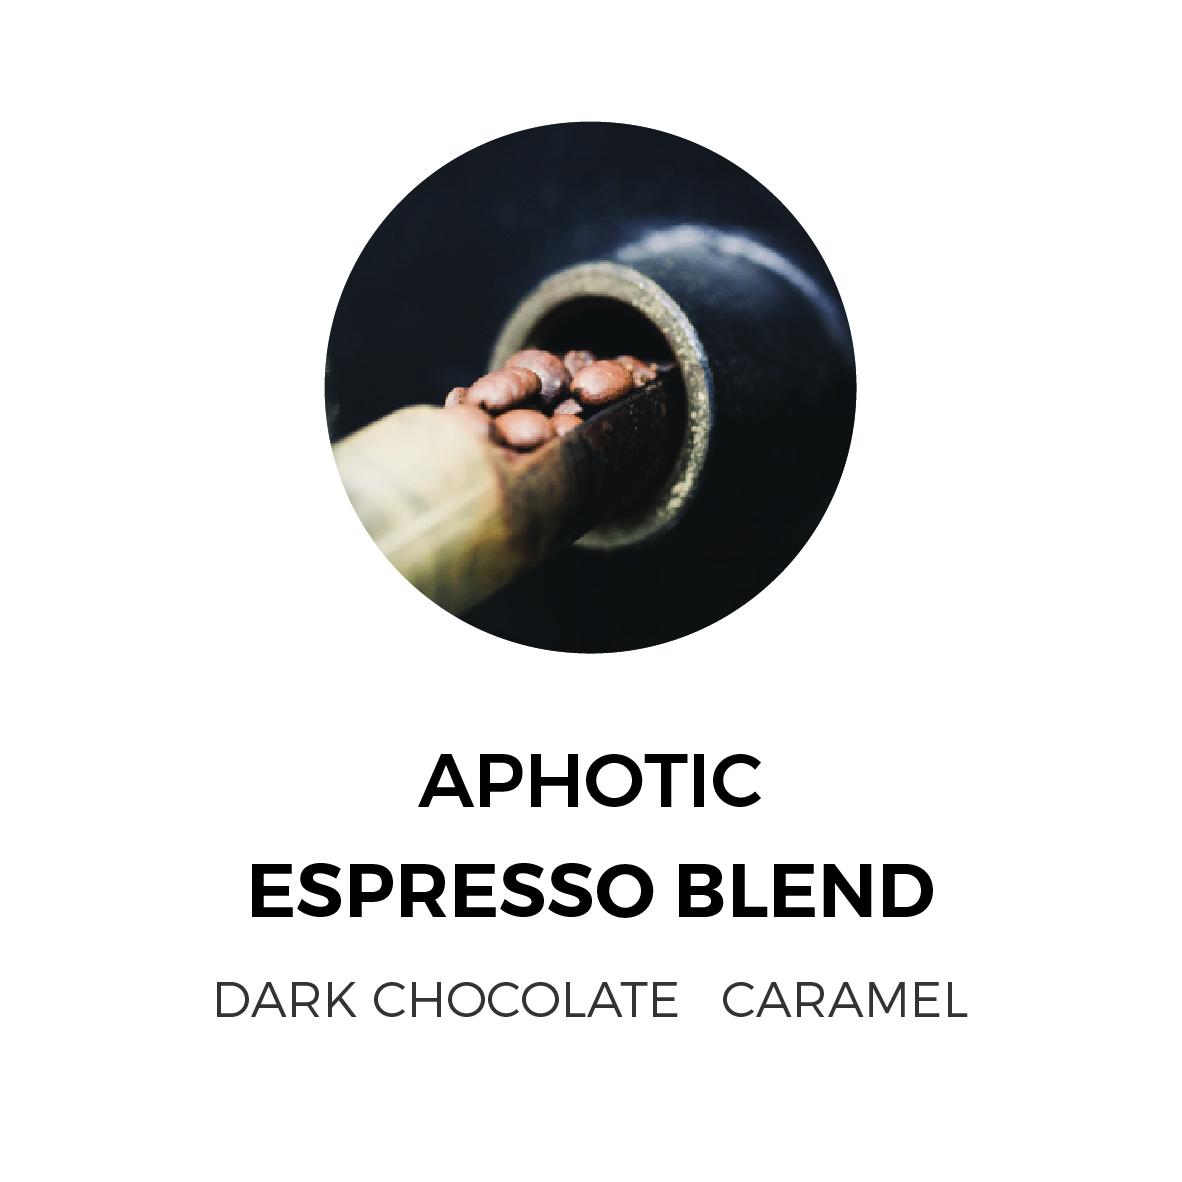 Blend-Aphotic-01.jpg